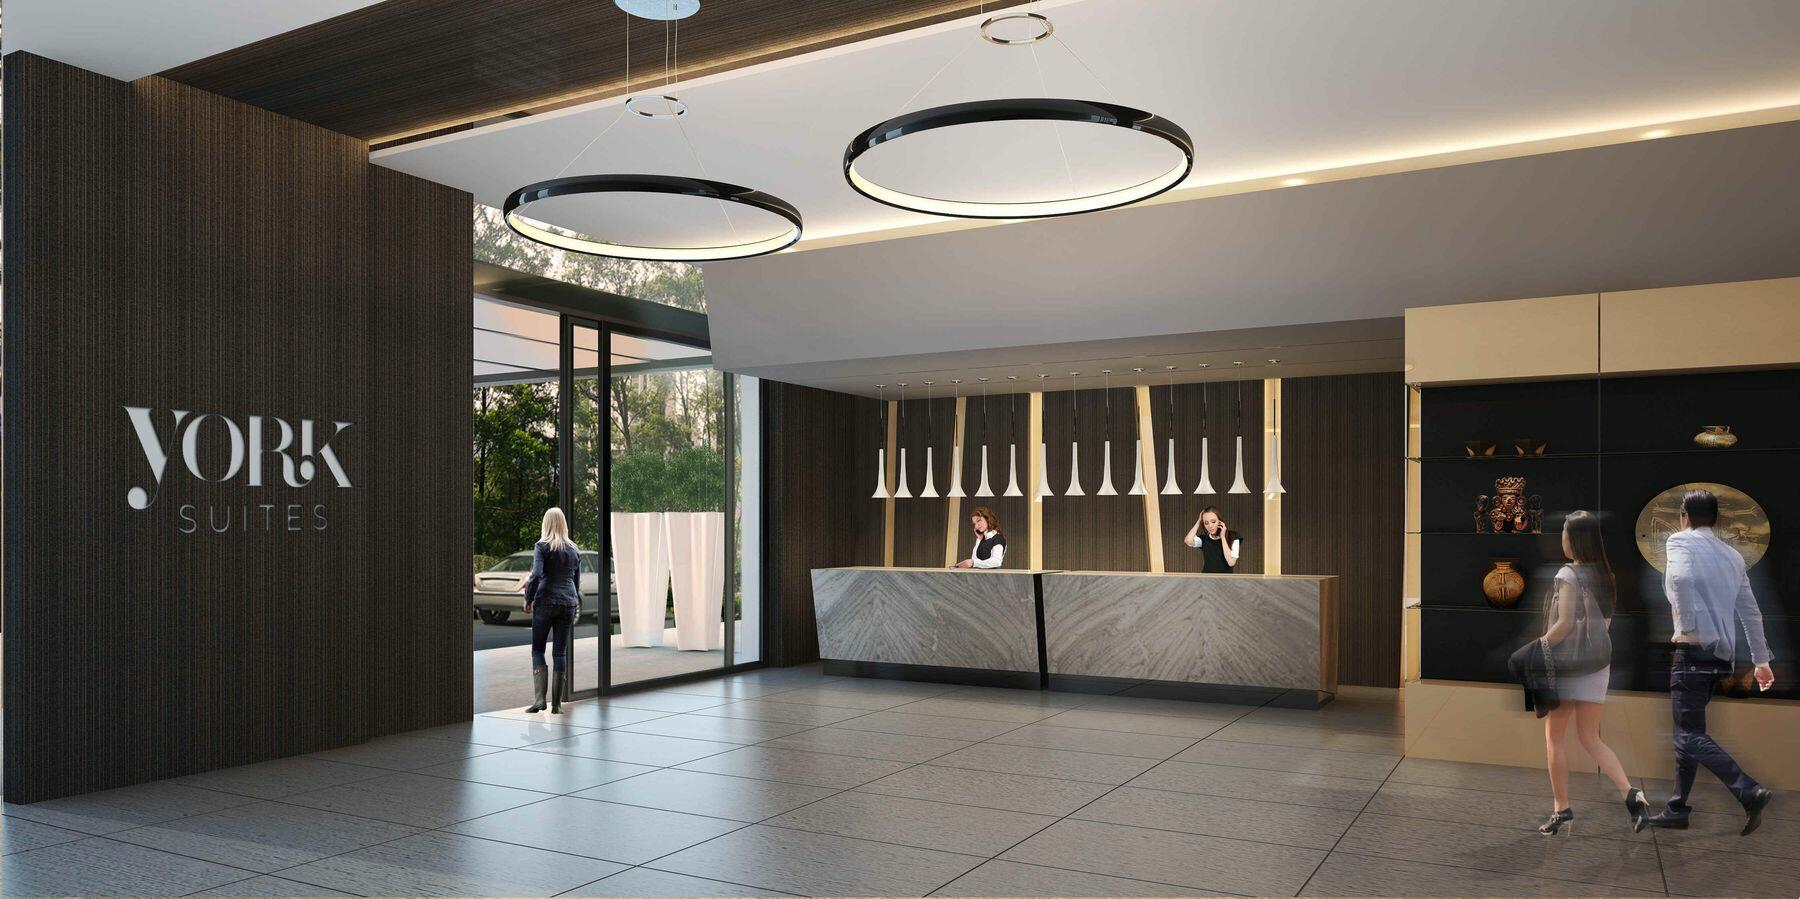 York Suites Lobby